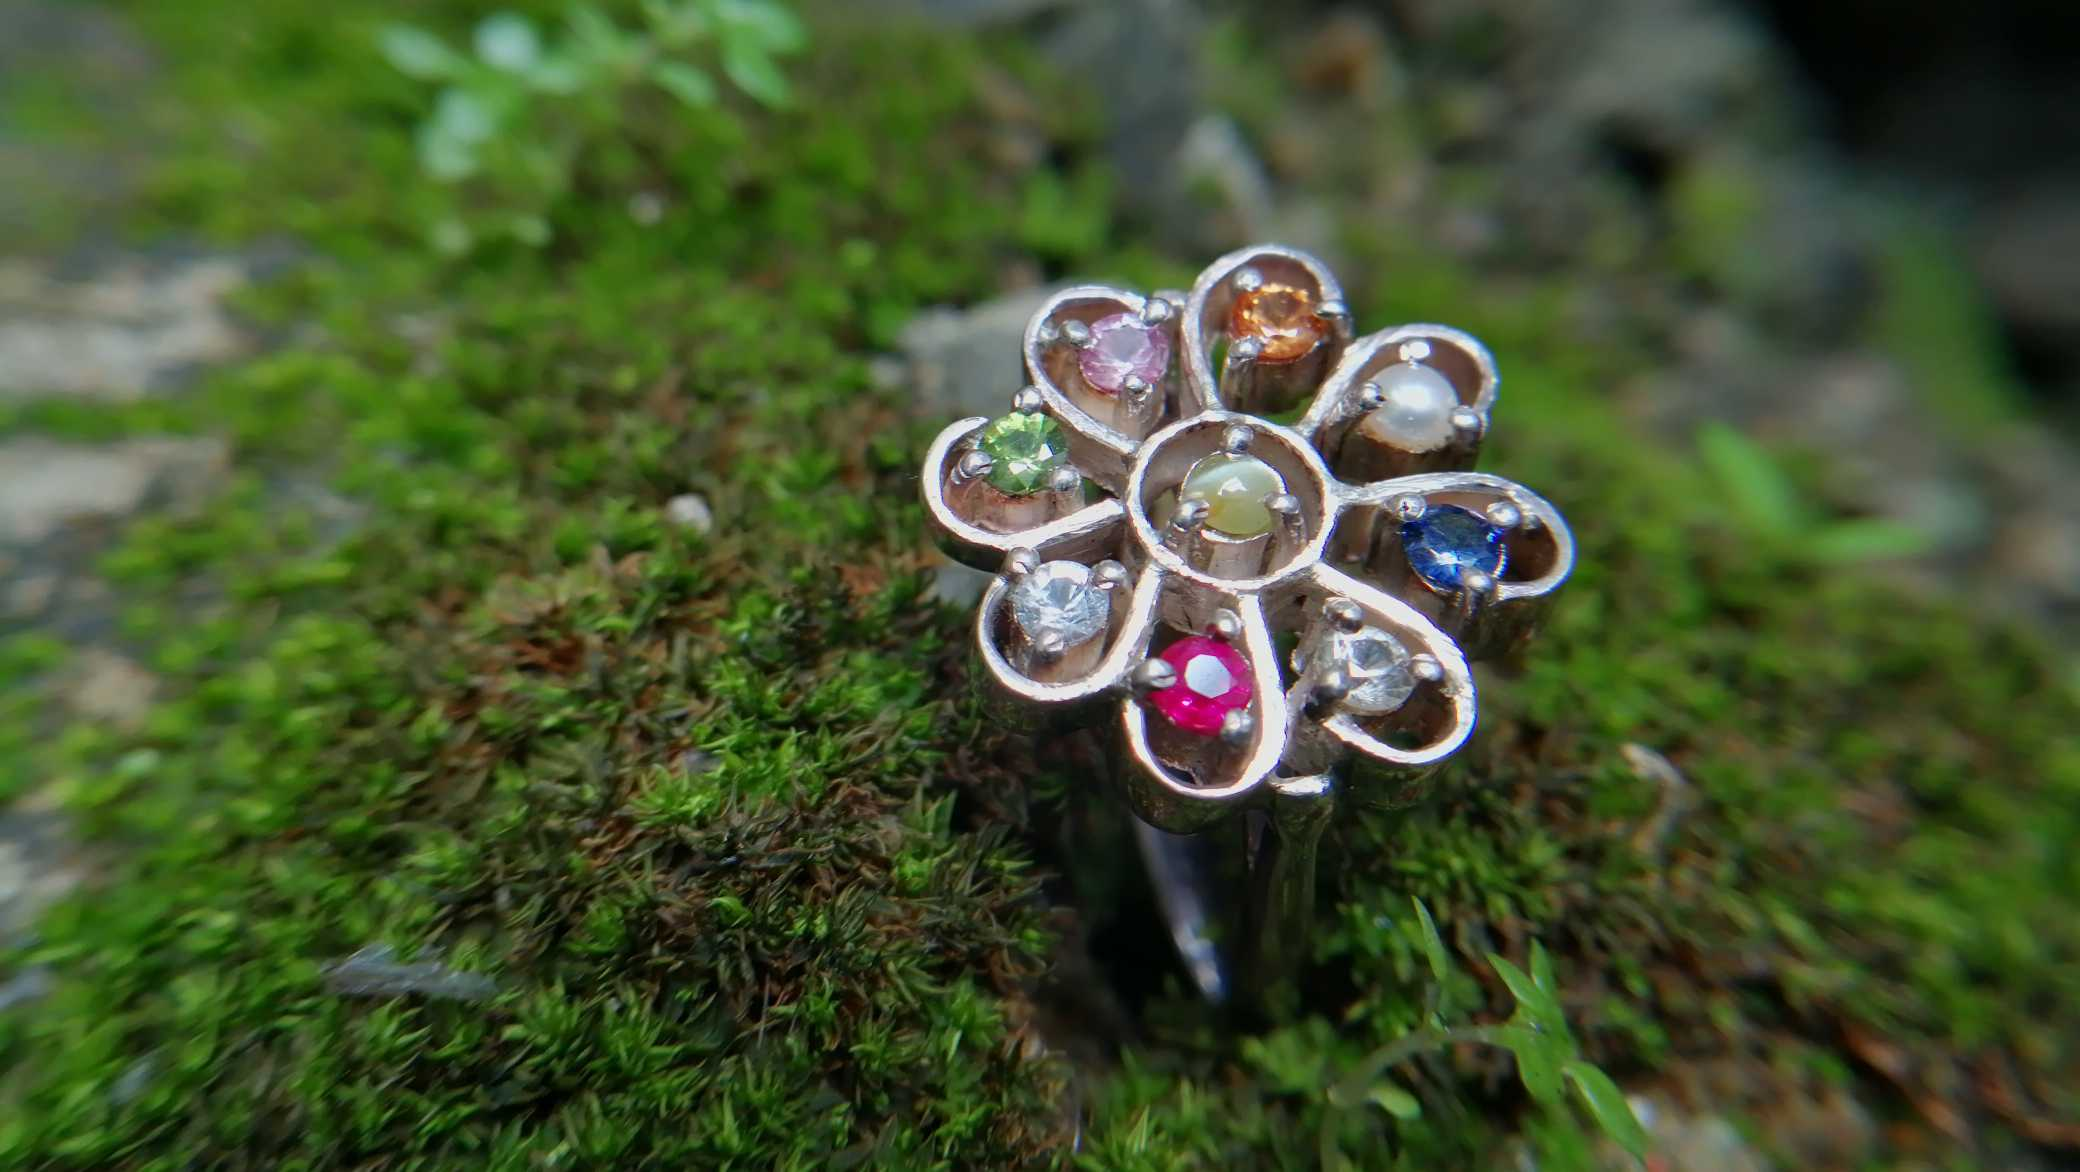 NATURAL 9 GEMSTONES Standard 925 ladies Silver Ring ( නවරත්න) Nawarathna